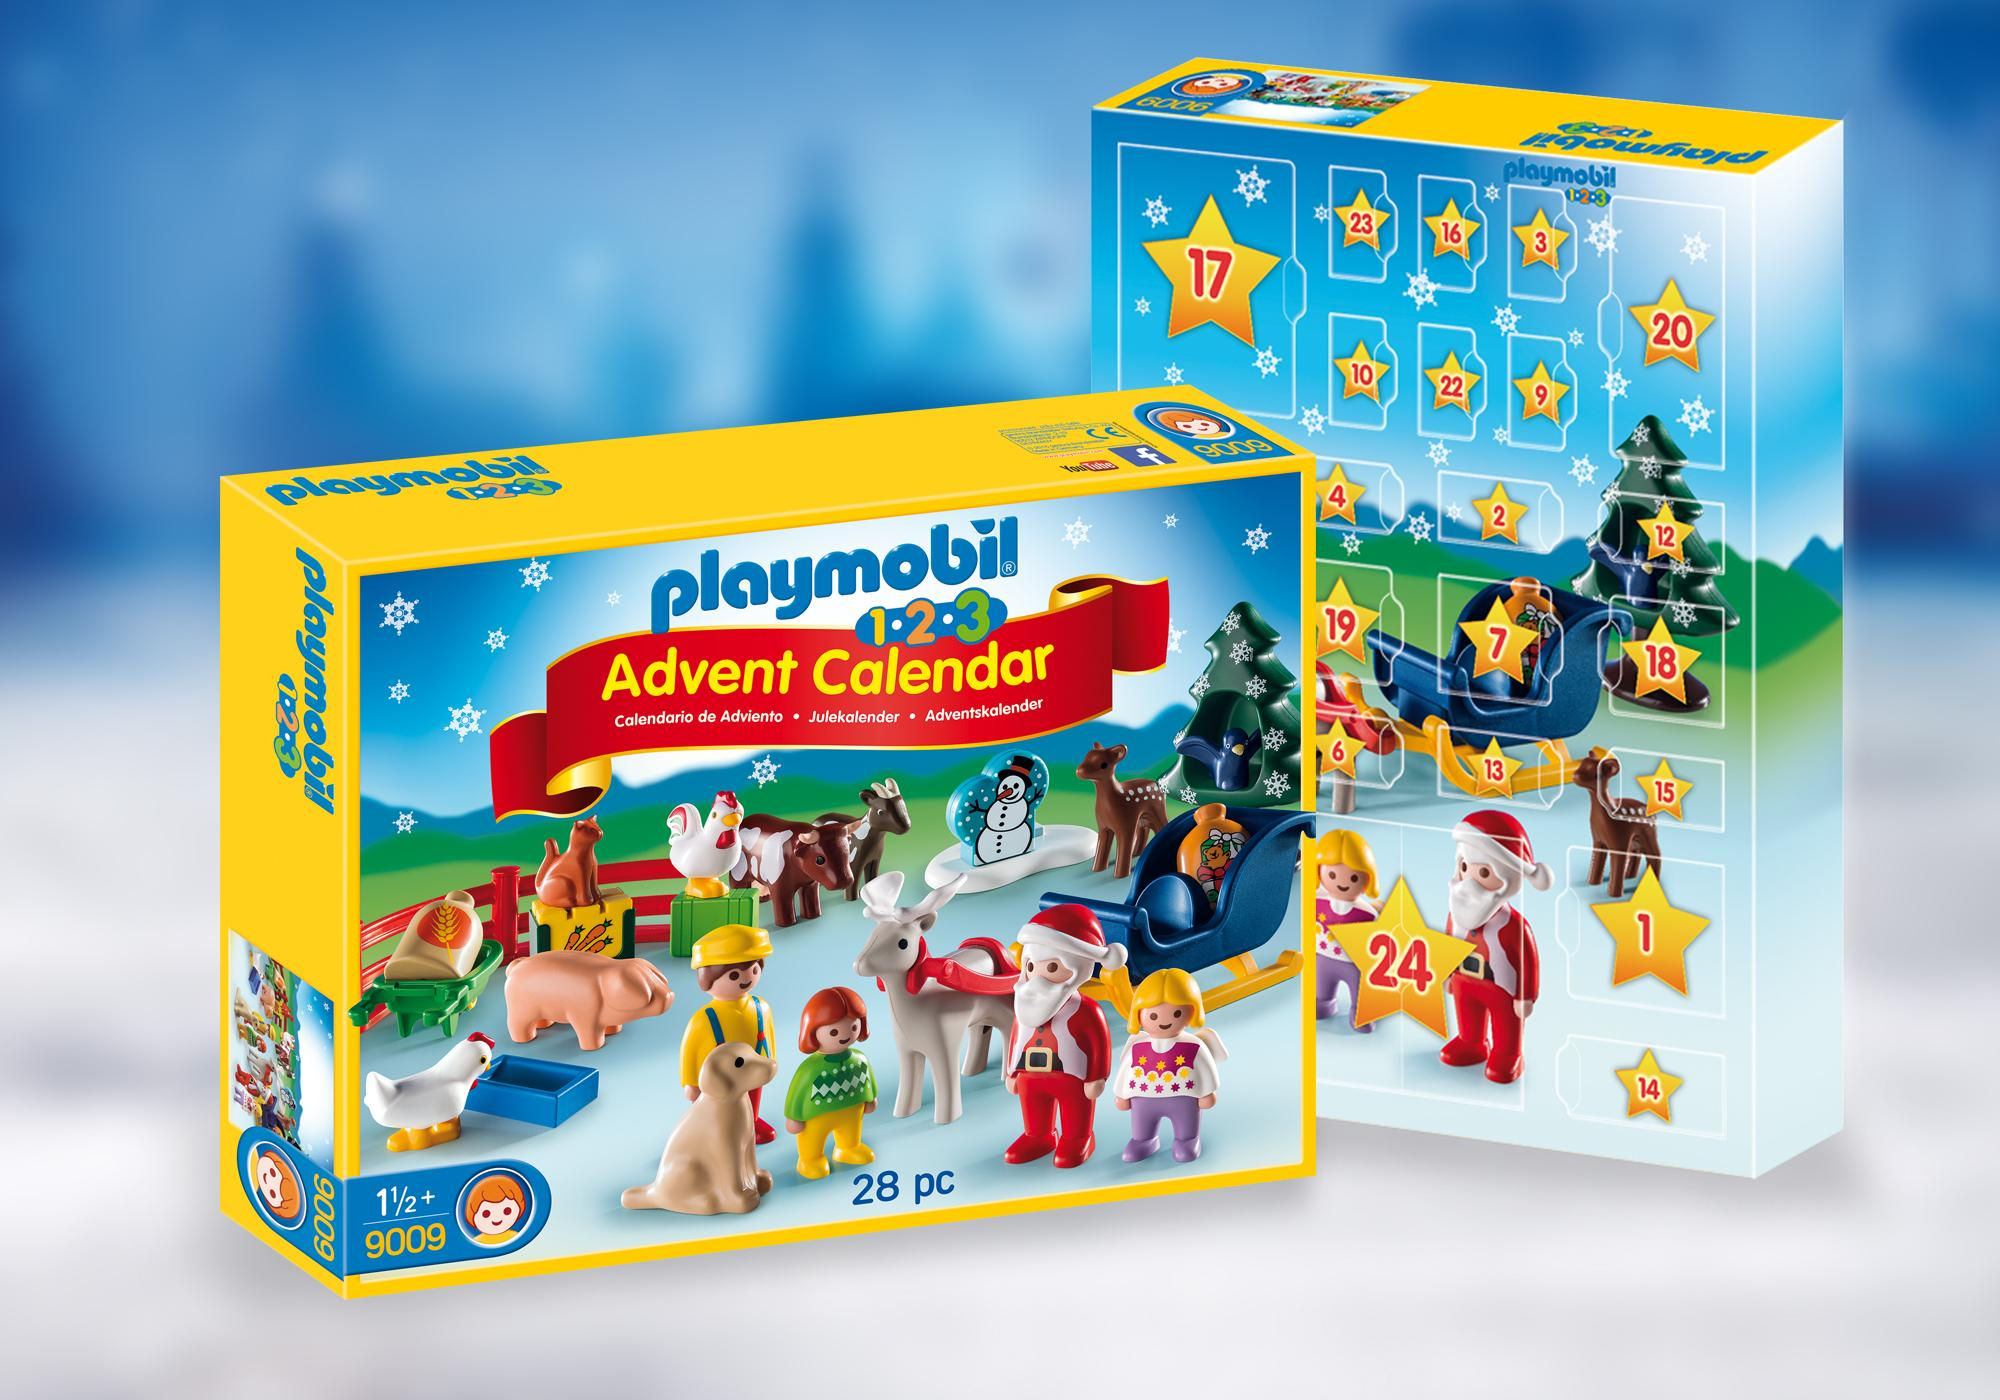 http://media.playmobil.com/i/playmobil/9009_product_detail/1.2.3 Advent Calendar Christmas on the Farm